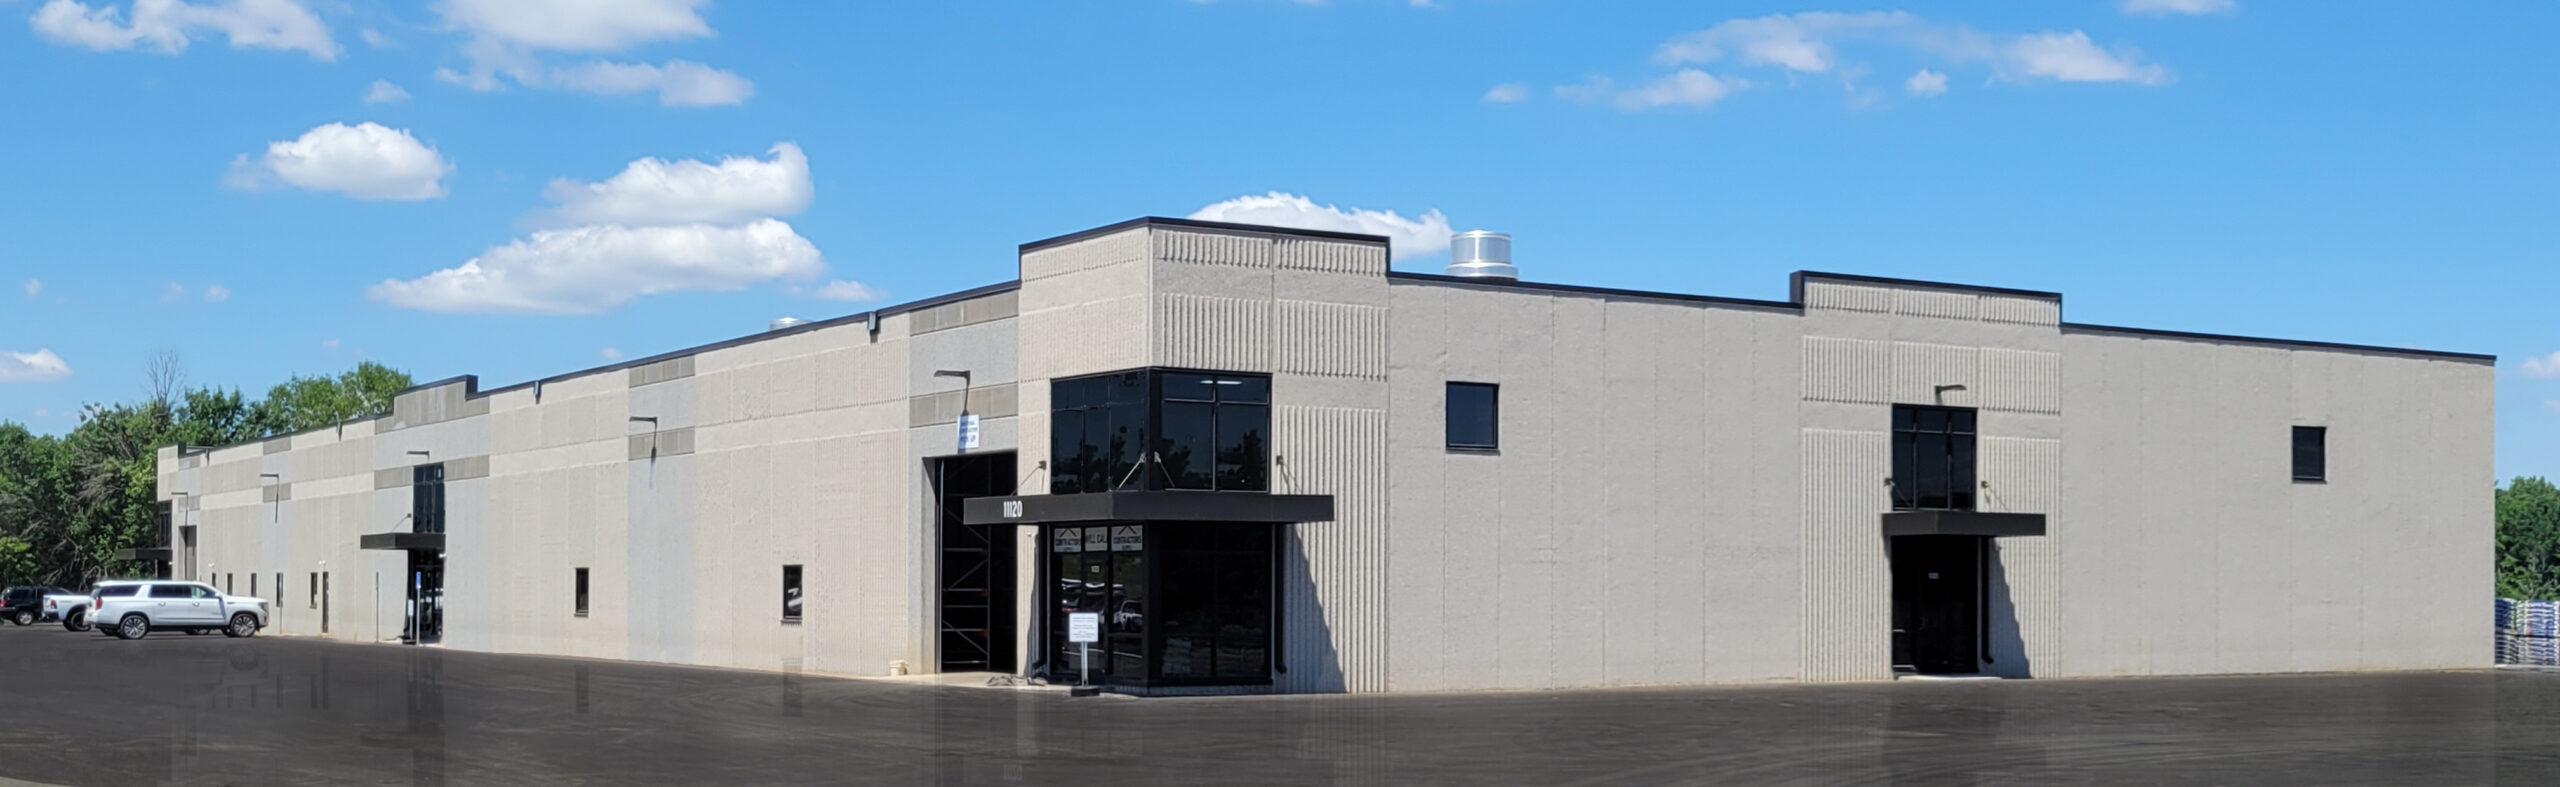 Concrete Tip Up Panel Office Warehouse Spec Building Lakeville MN by Appro Development-01